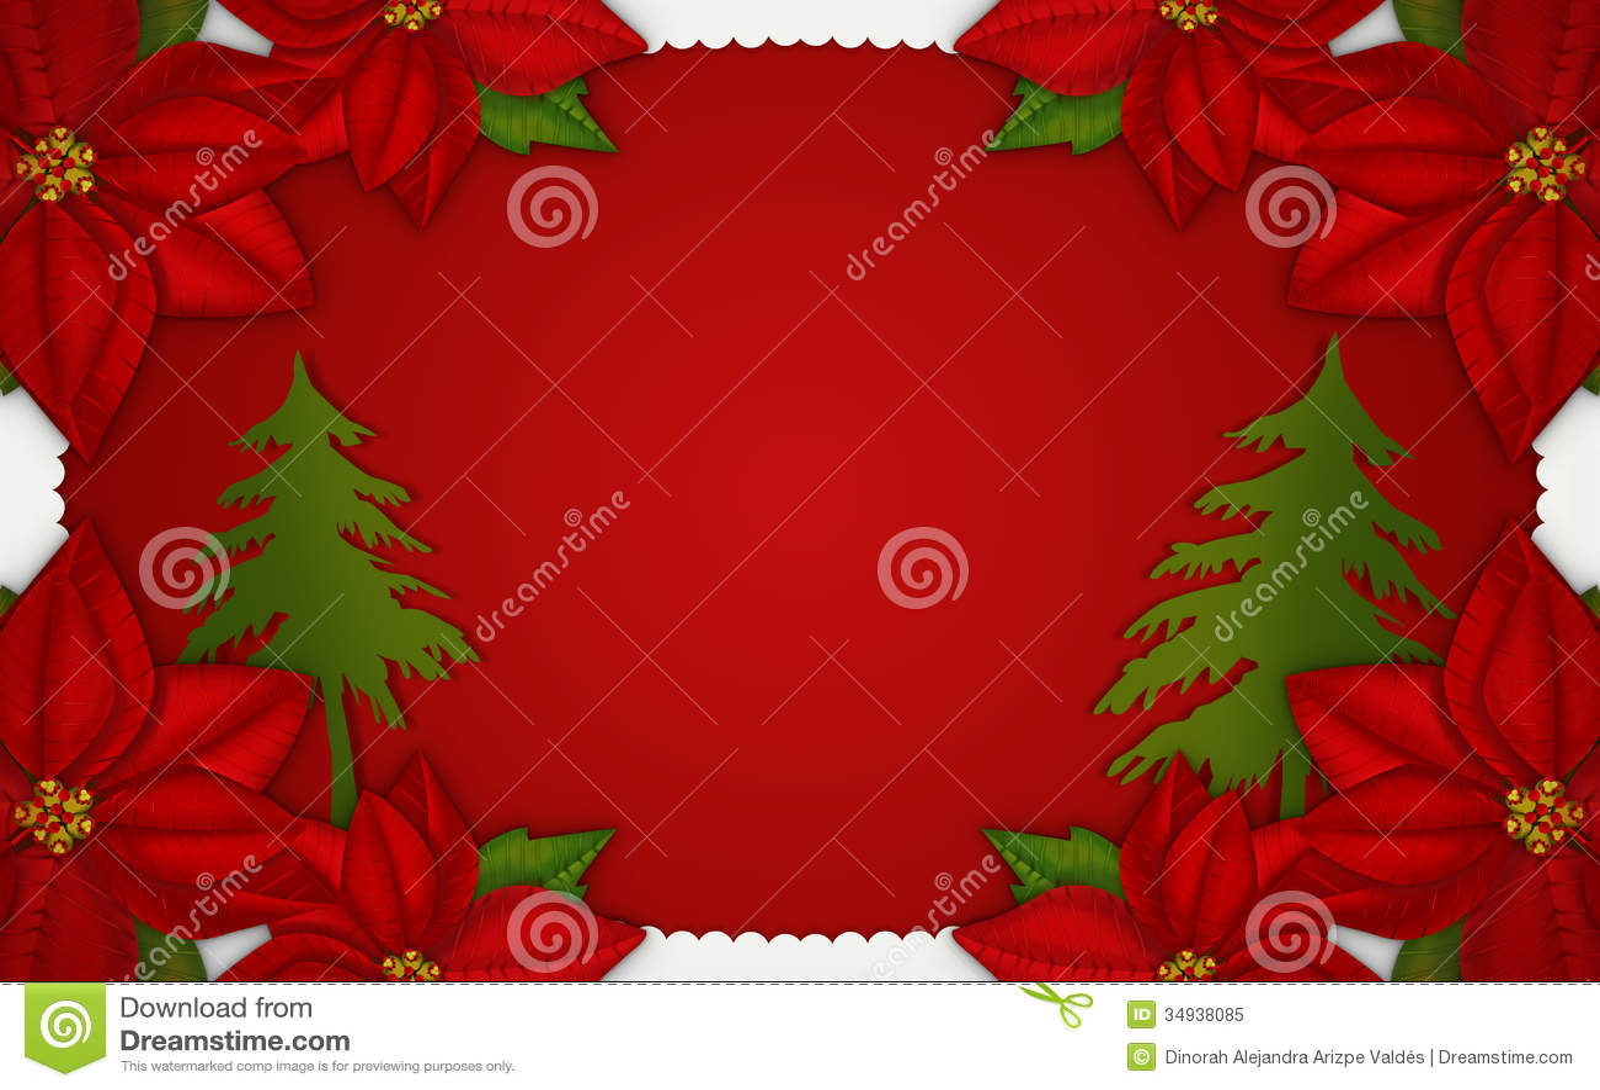 Christmas window illustration royalty free stock photo for Poinsettia christmas tree frame